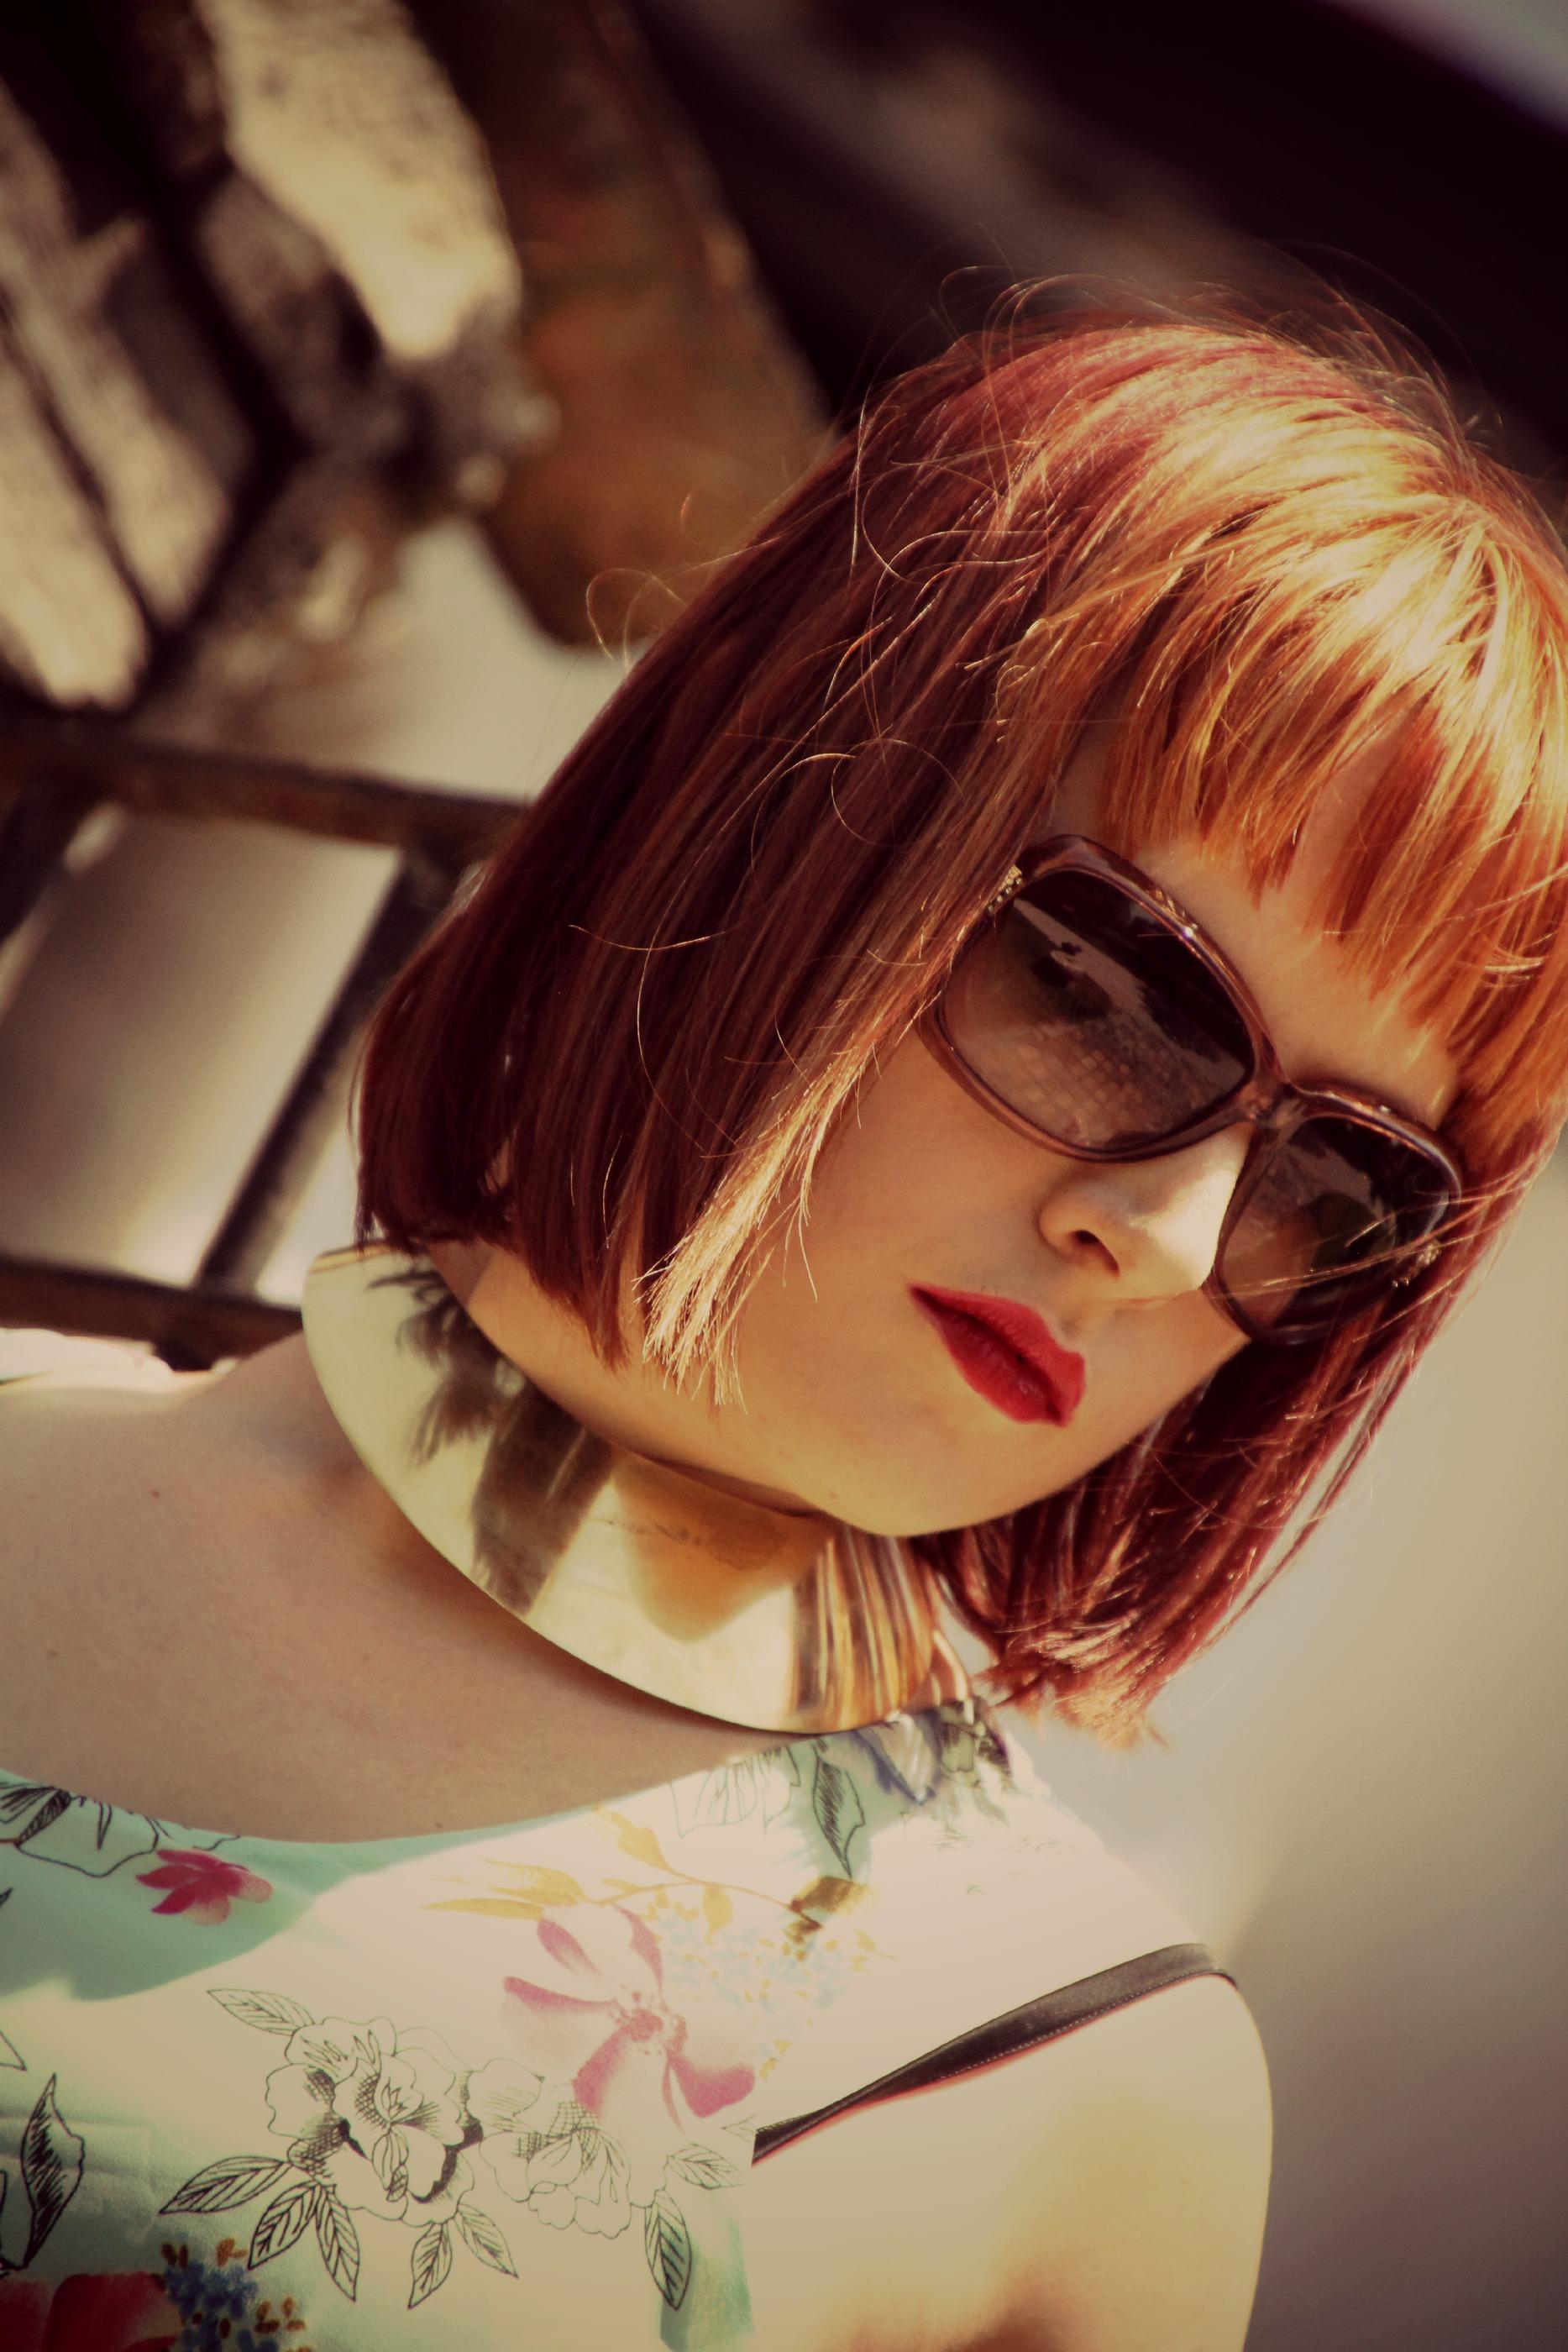 alessia milanese, thechilicool,fashion blog, fashion blogger, balenciaga bag, shenside dress